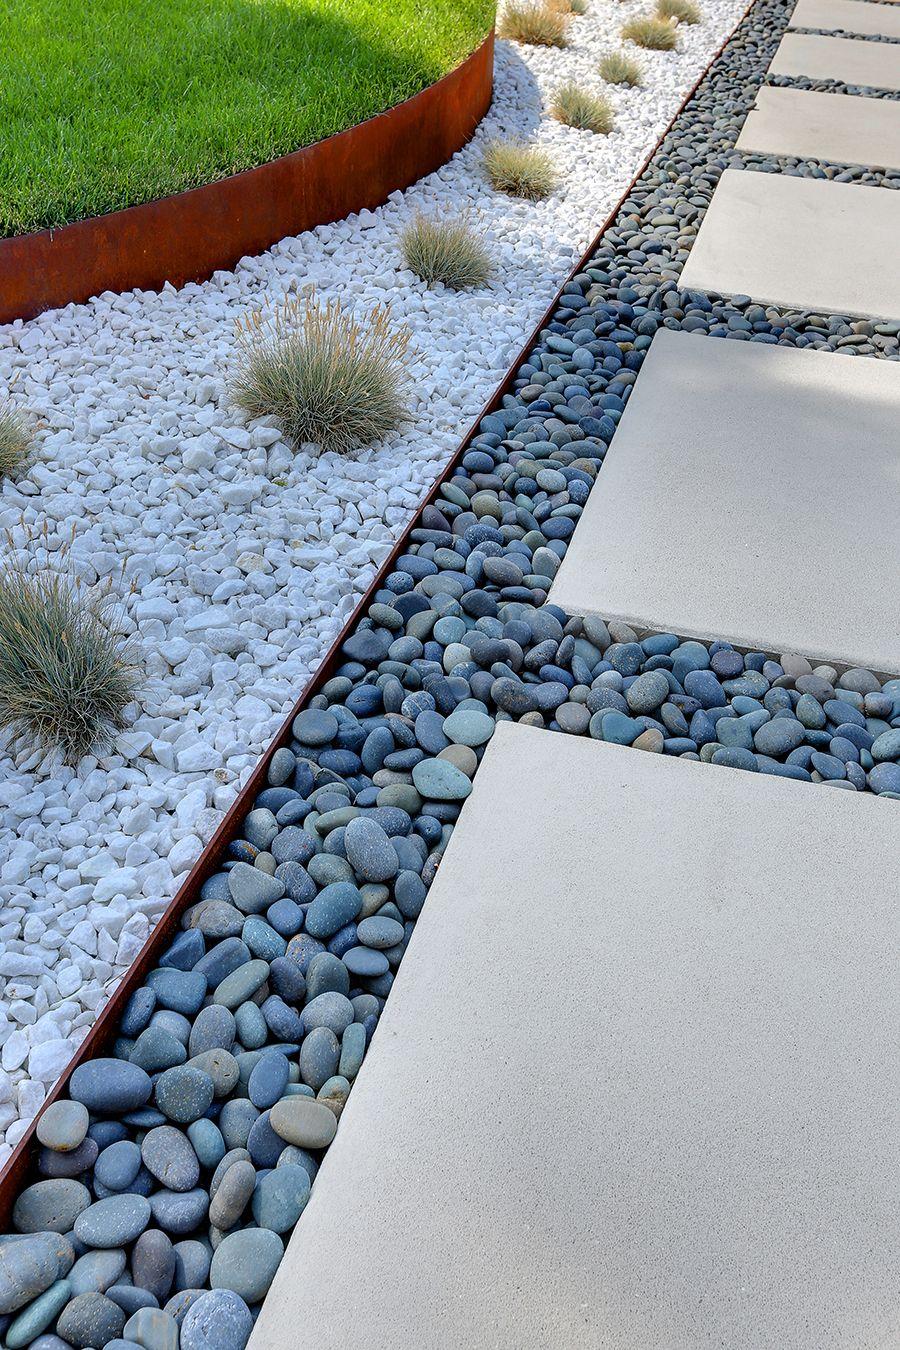 Modern In Denver   Modern Living Inside   Out   Curb Appeal. Modern In Denver   Modern Living Inside   Out   Curb Appeal